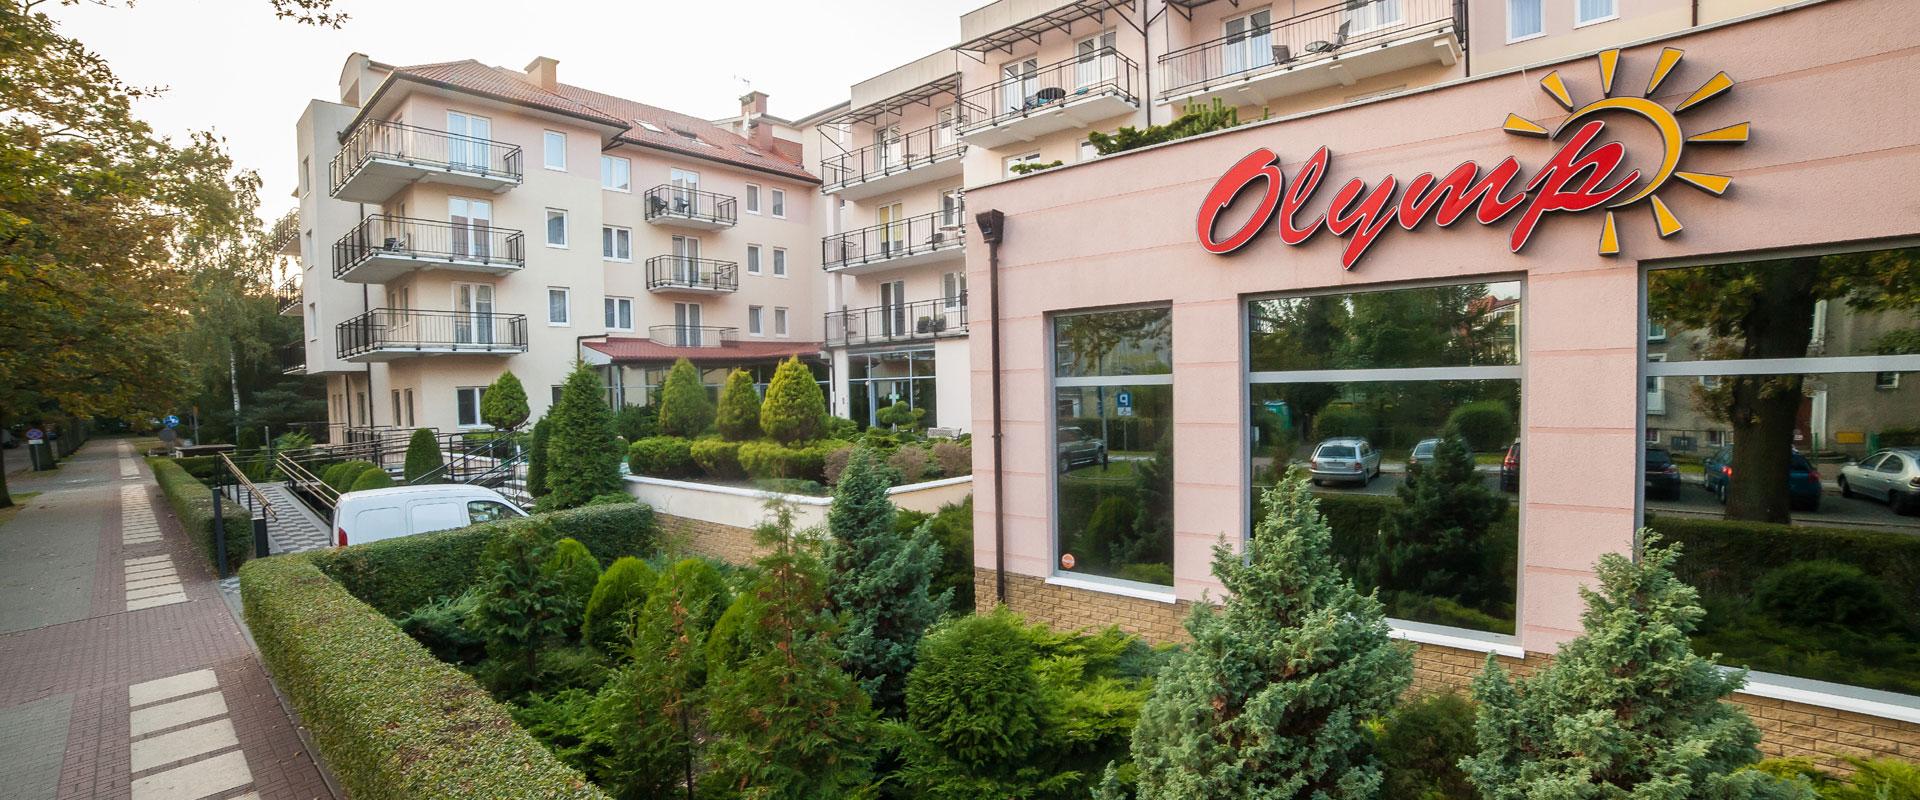 various design discount shop various design Olymp SPA - Home